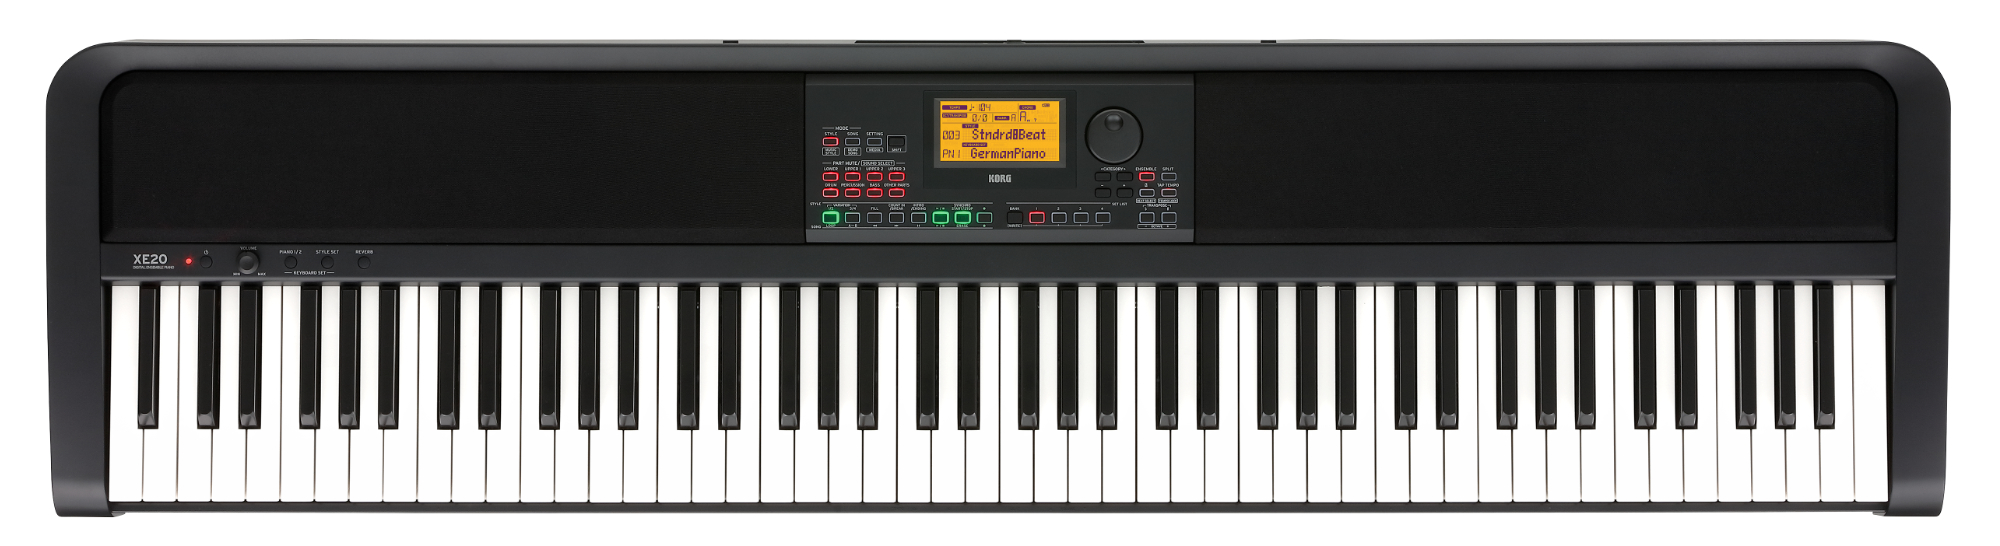 Stagepianos - Korg XE20 Digital Ensemble Piano - Onlineshop Musikhaus Kirstein